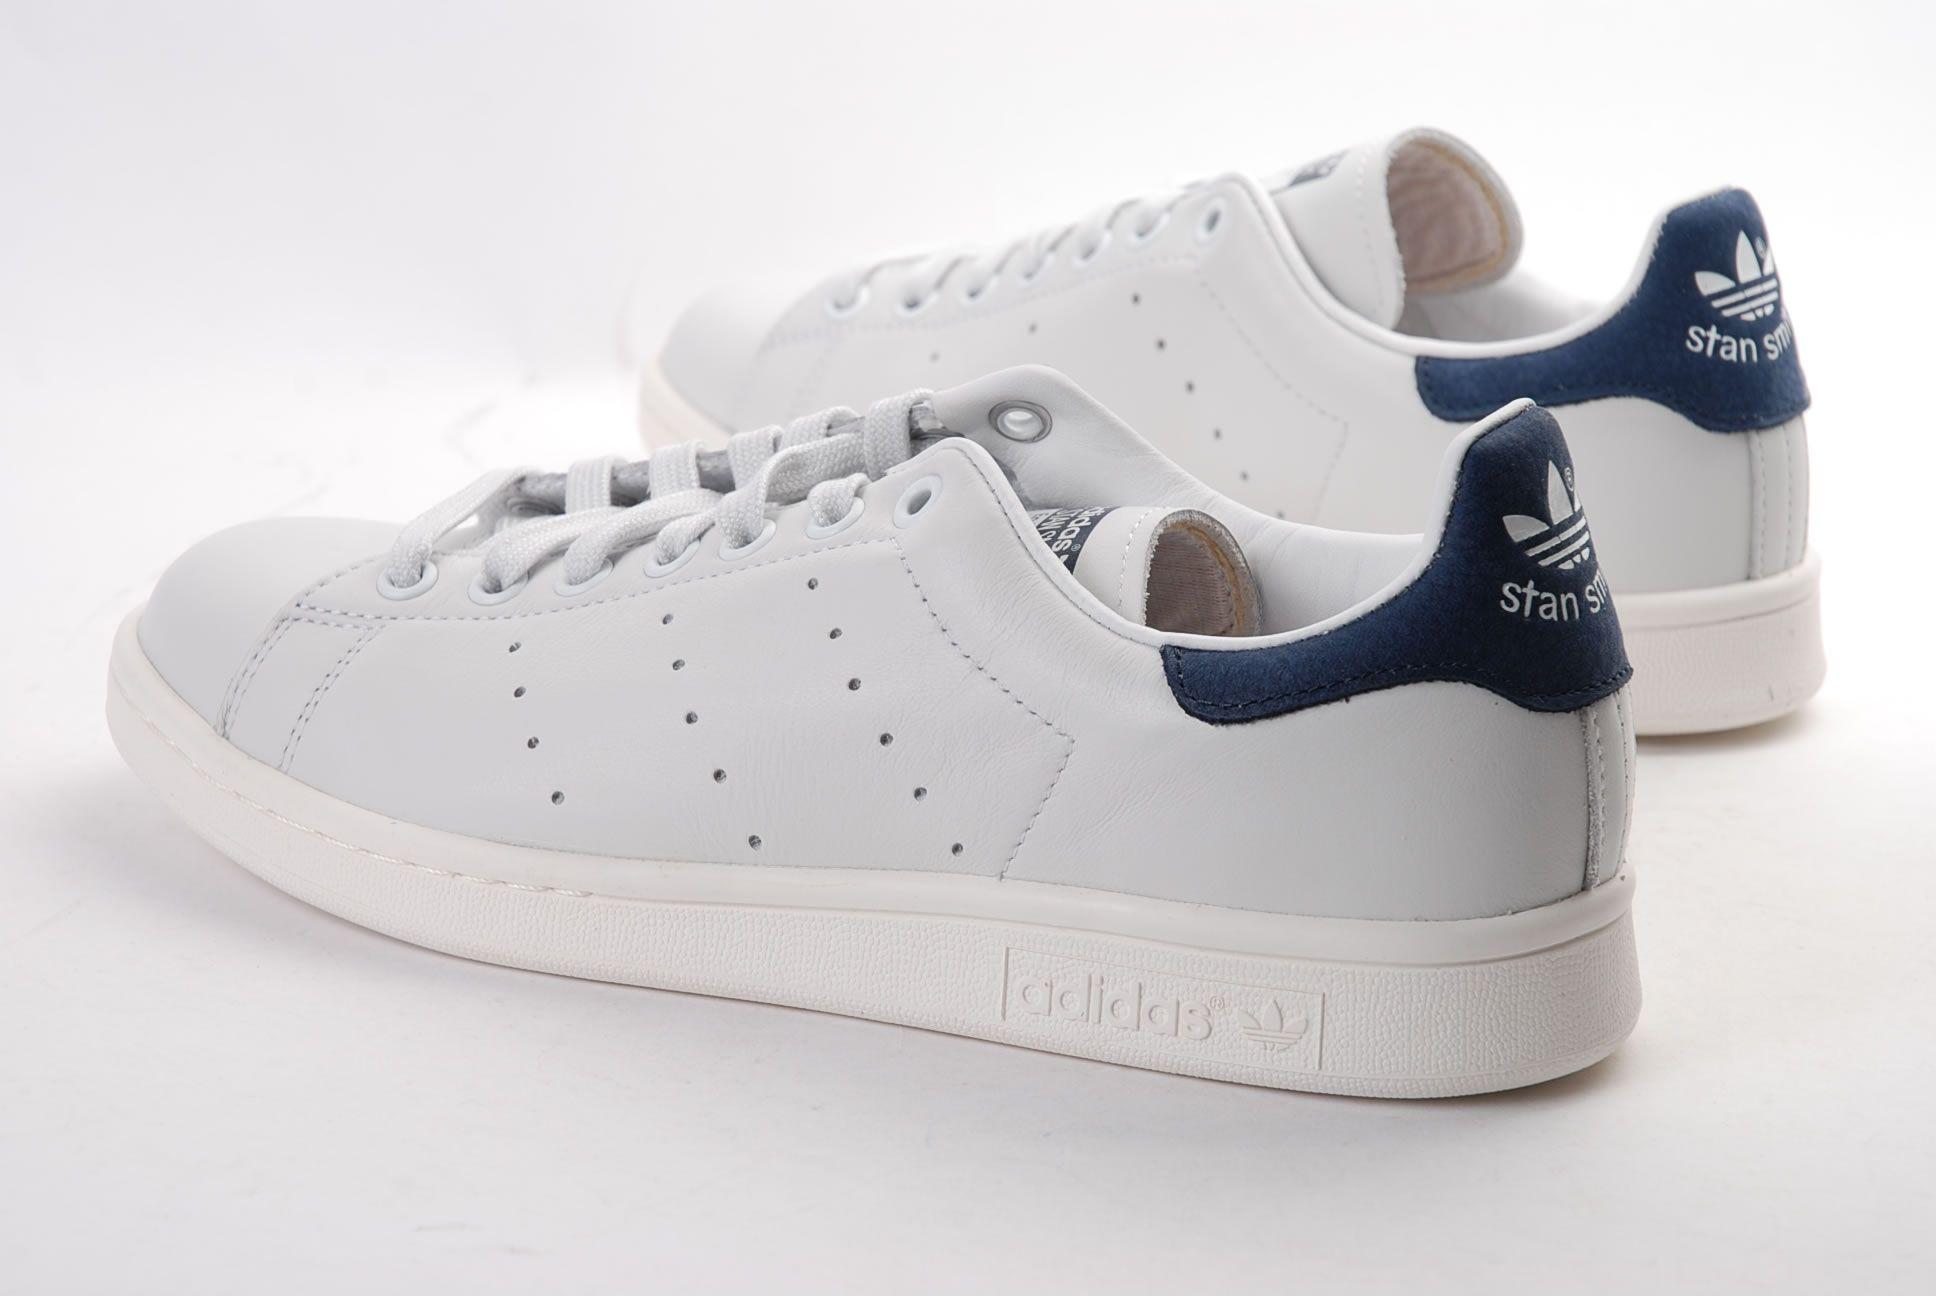 Adidas Stan Smith OG Blanc/Bleu / d67362